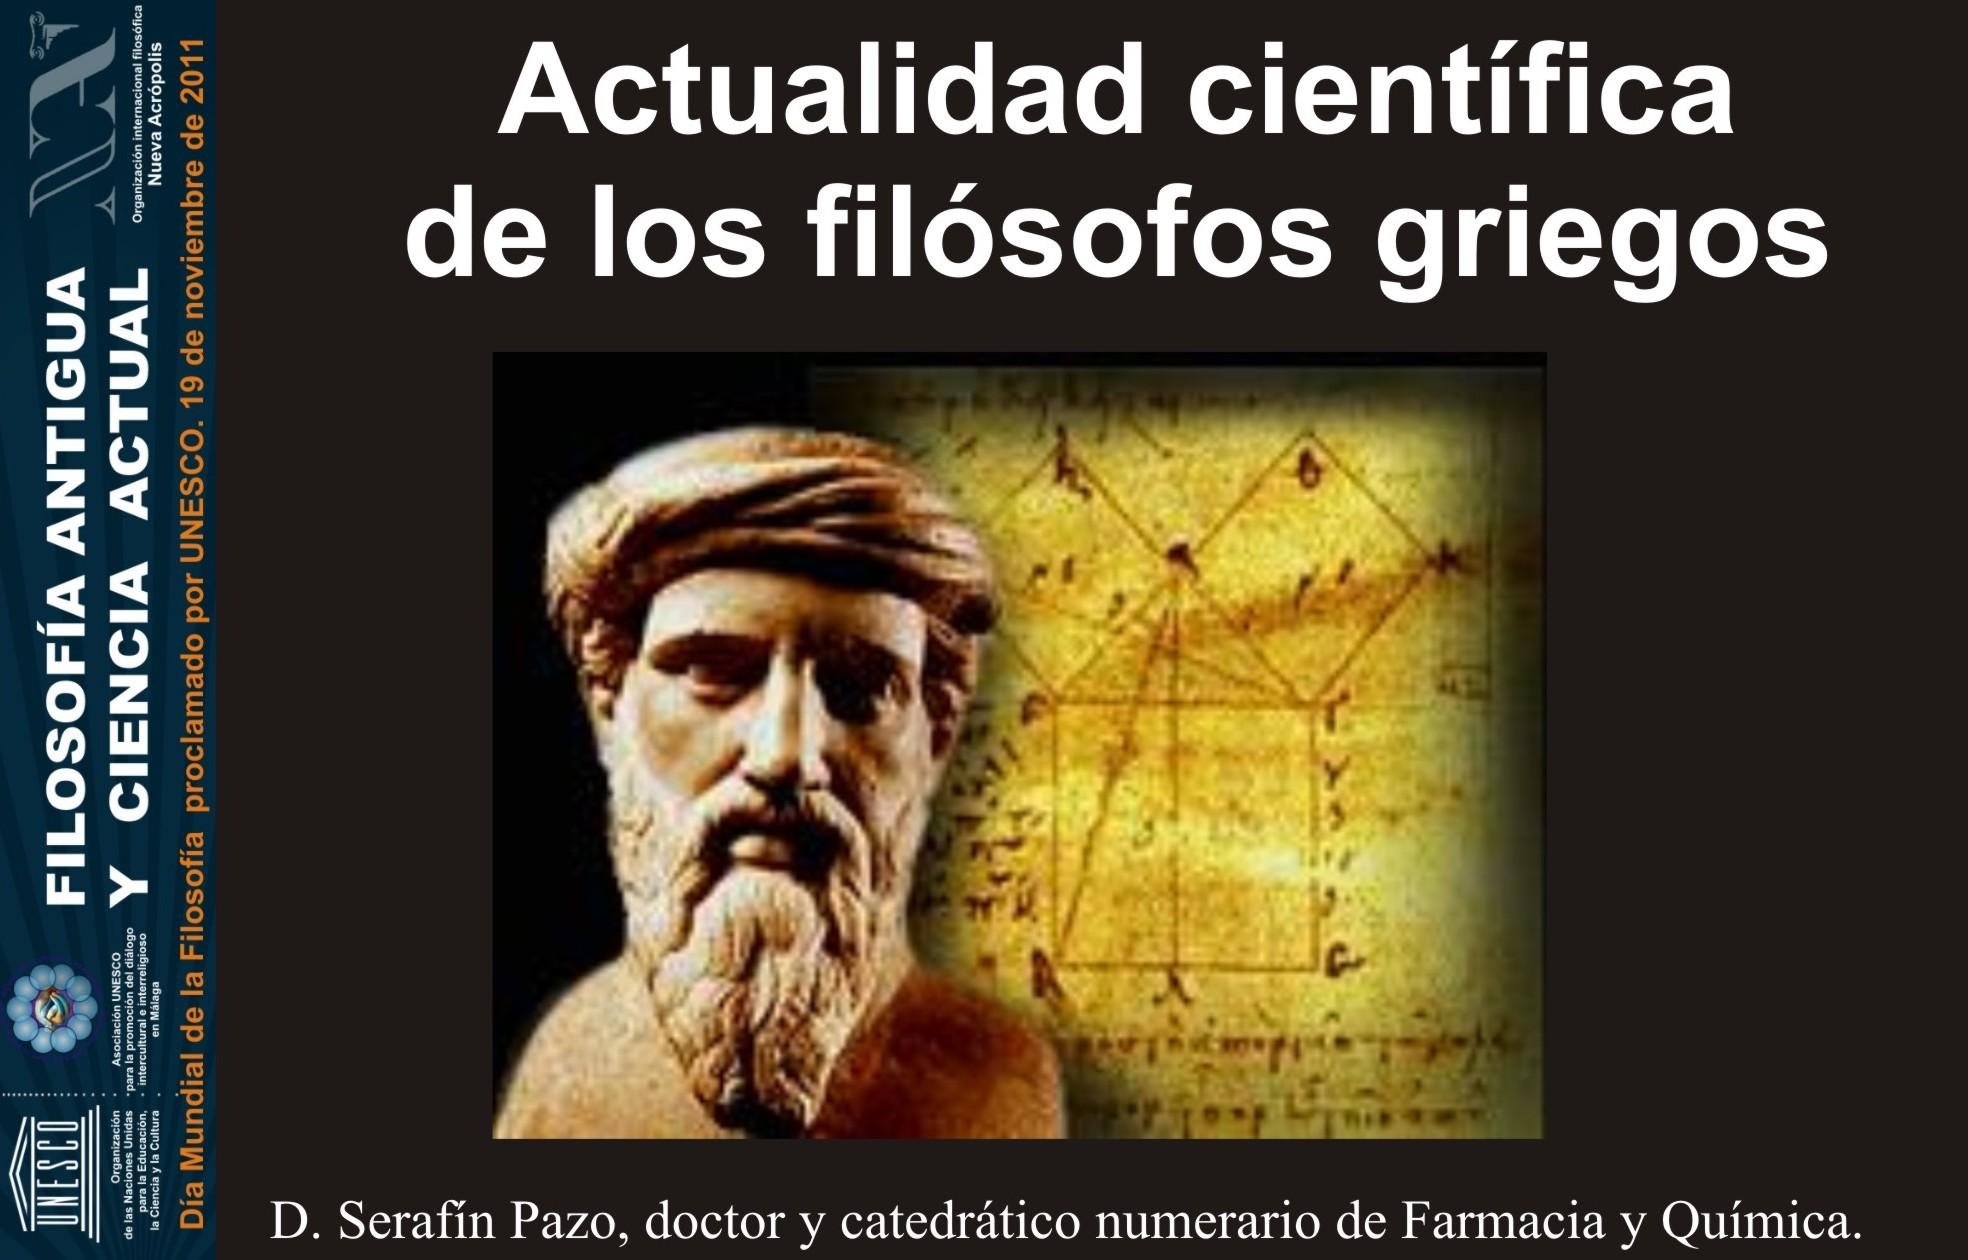 http://filosofia.nueva-acropolis.es/wp-content/uploads/2011/11/filosofos-griegos.jpg